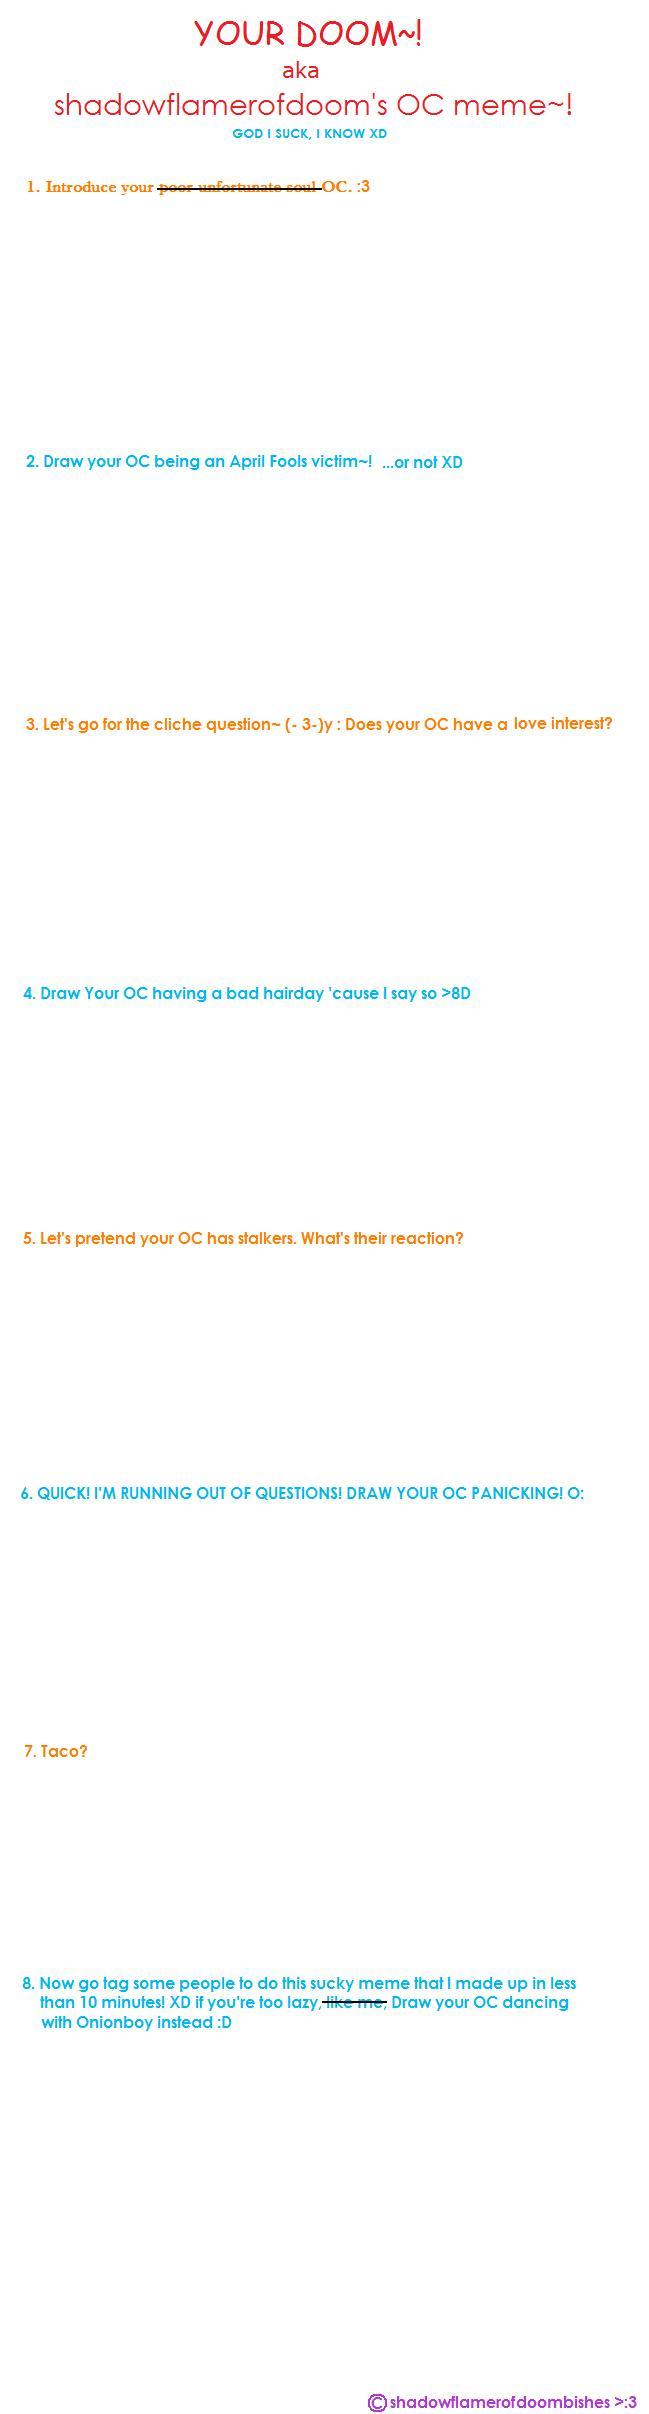 stupid OC meme template XD by shadowflamerofdoom on deviantART